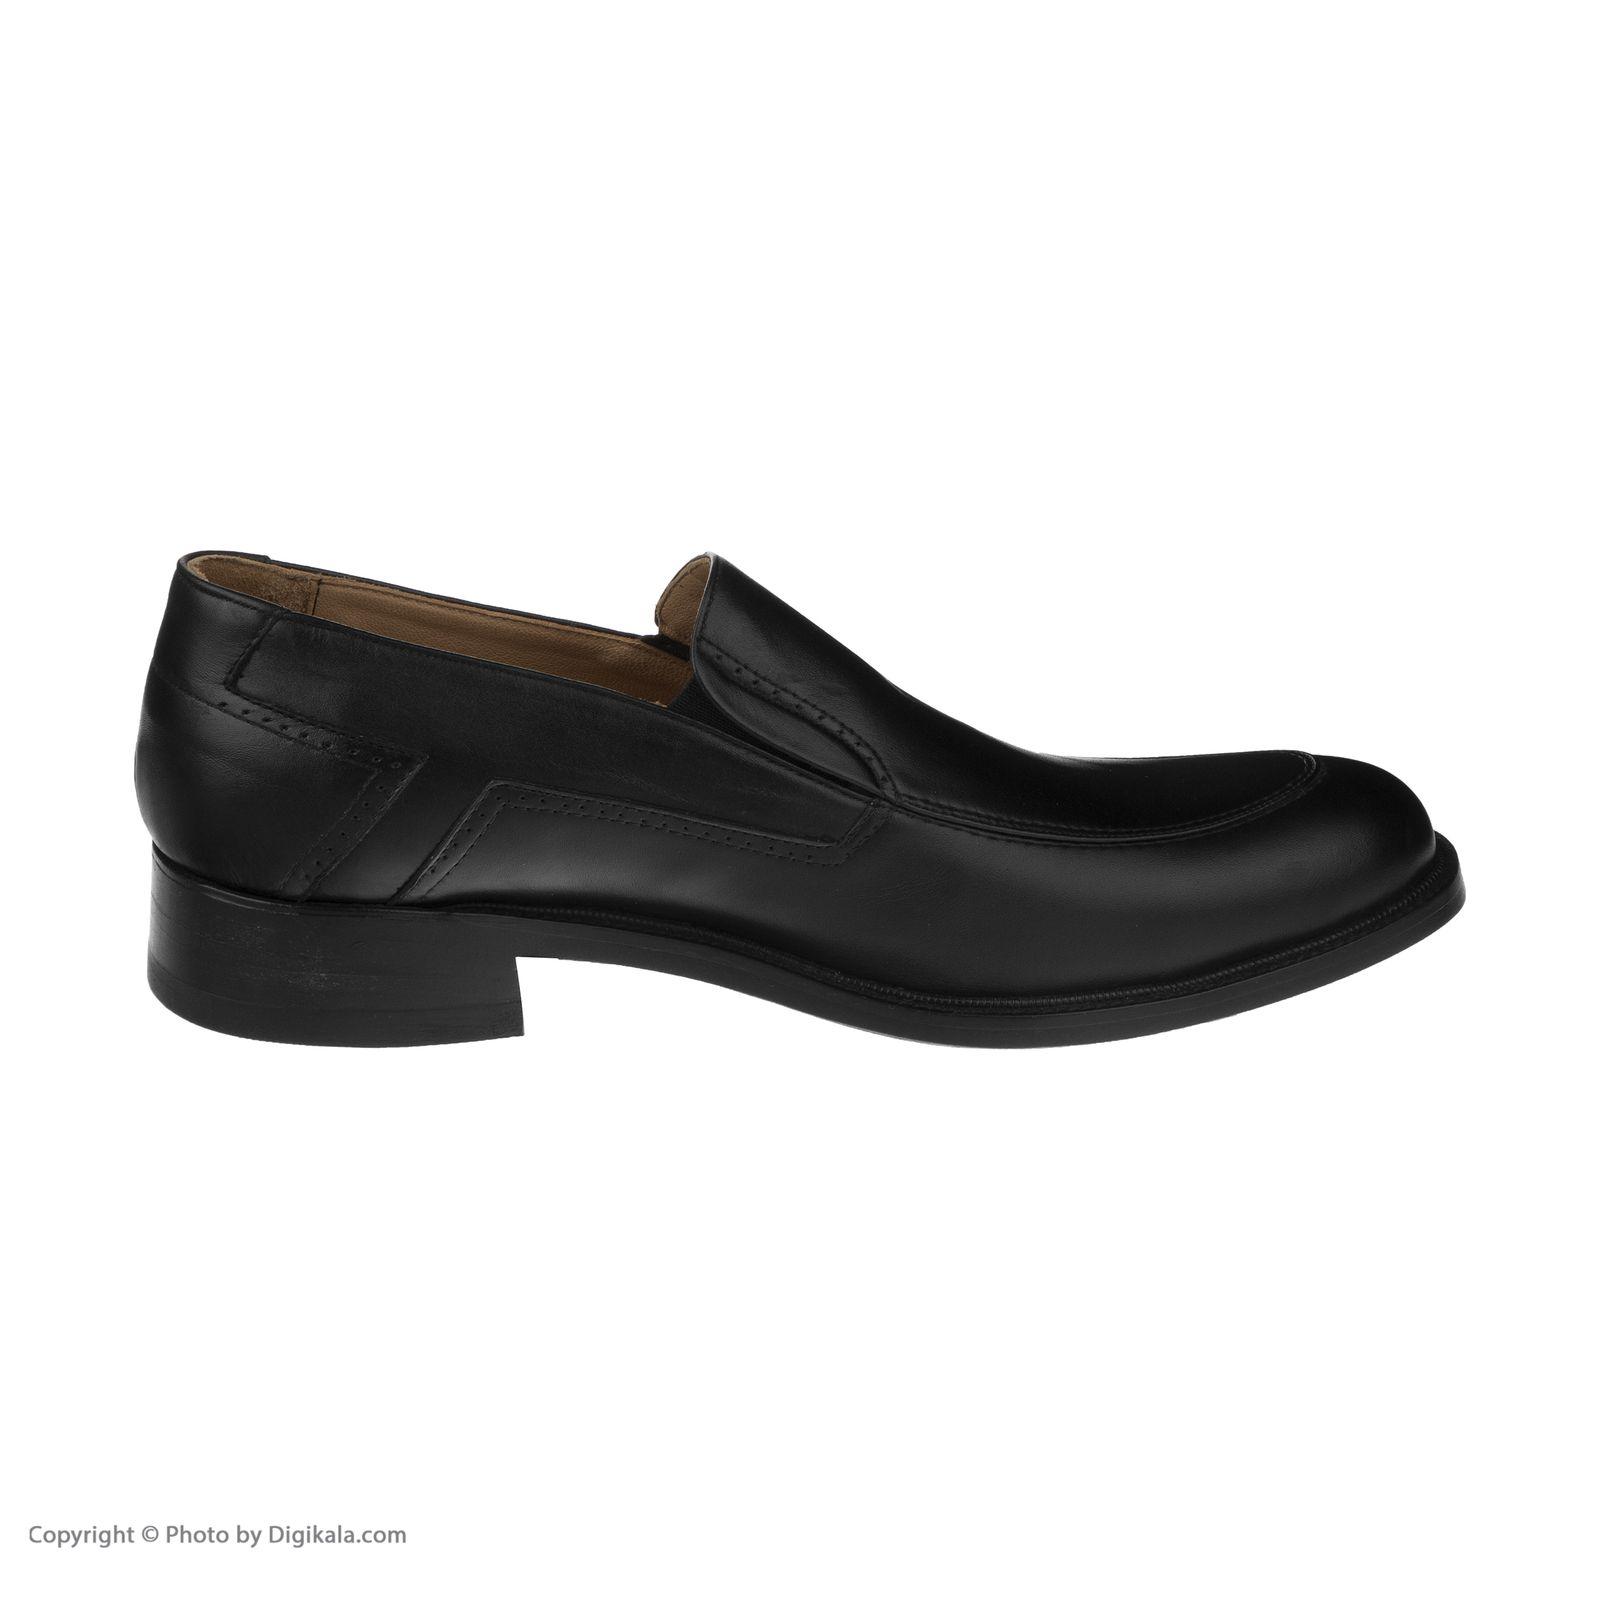 کفش مردانه نظری کد 426 -  - 5